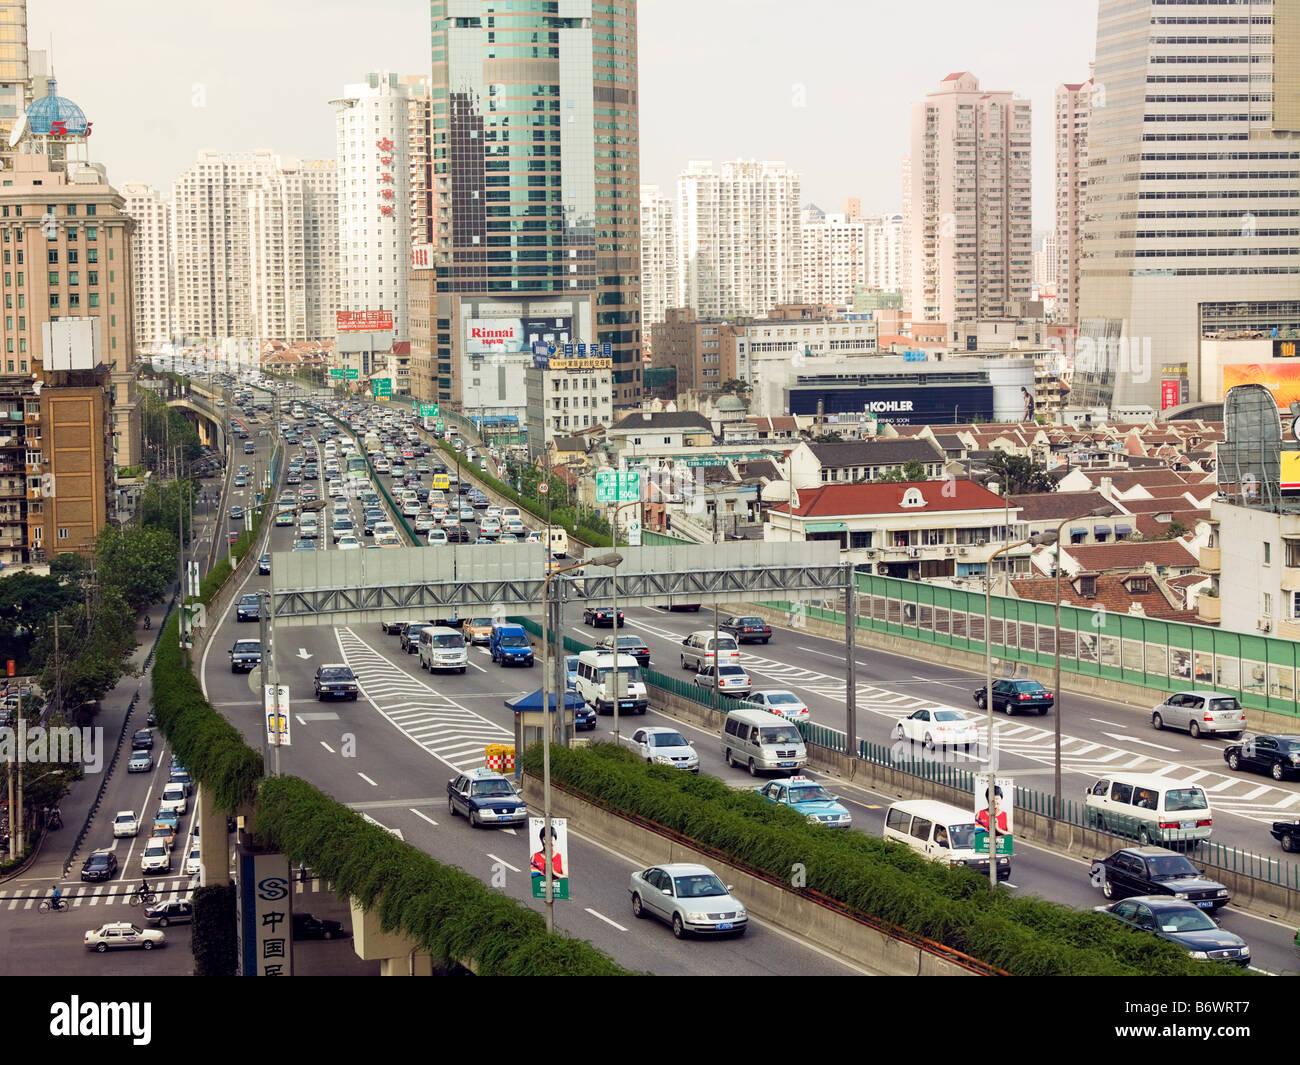 Elevated highway in shanghai - Stock Image